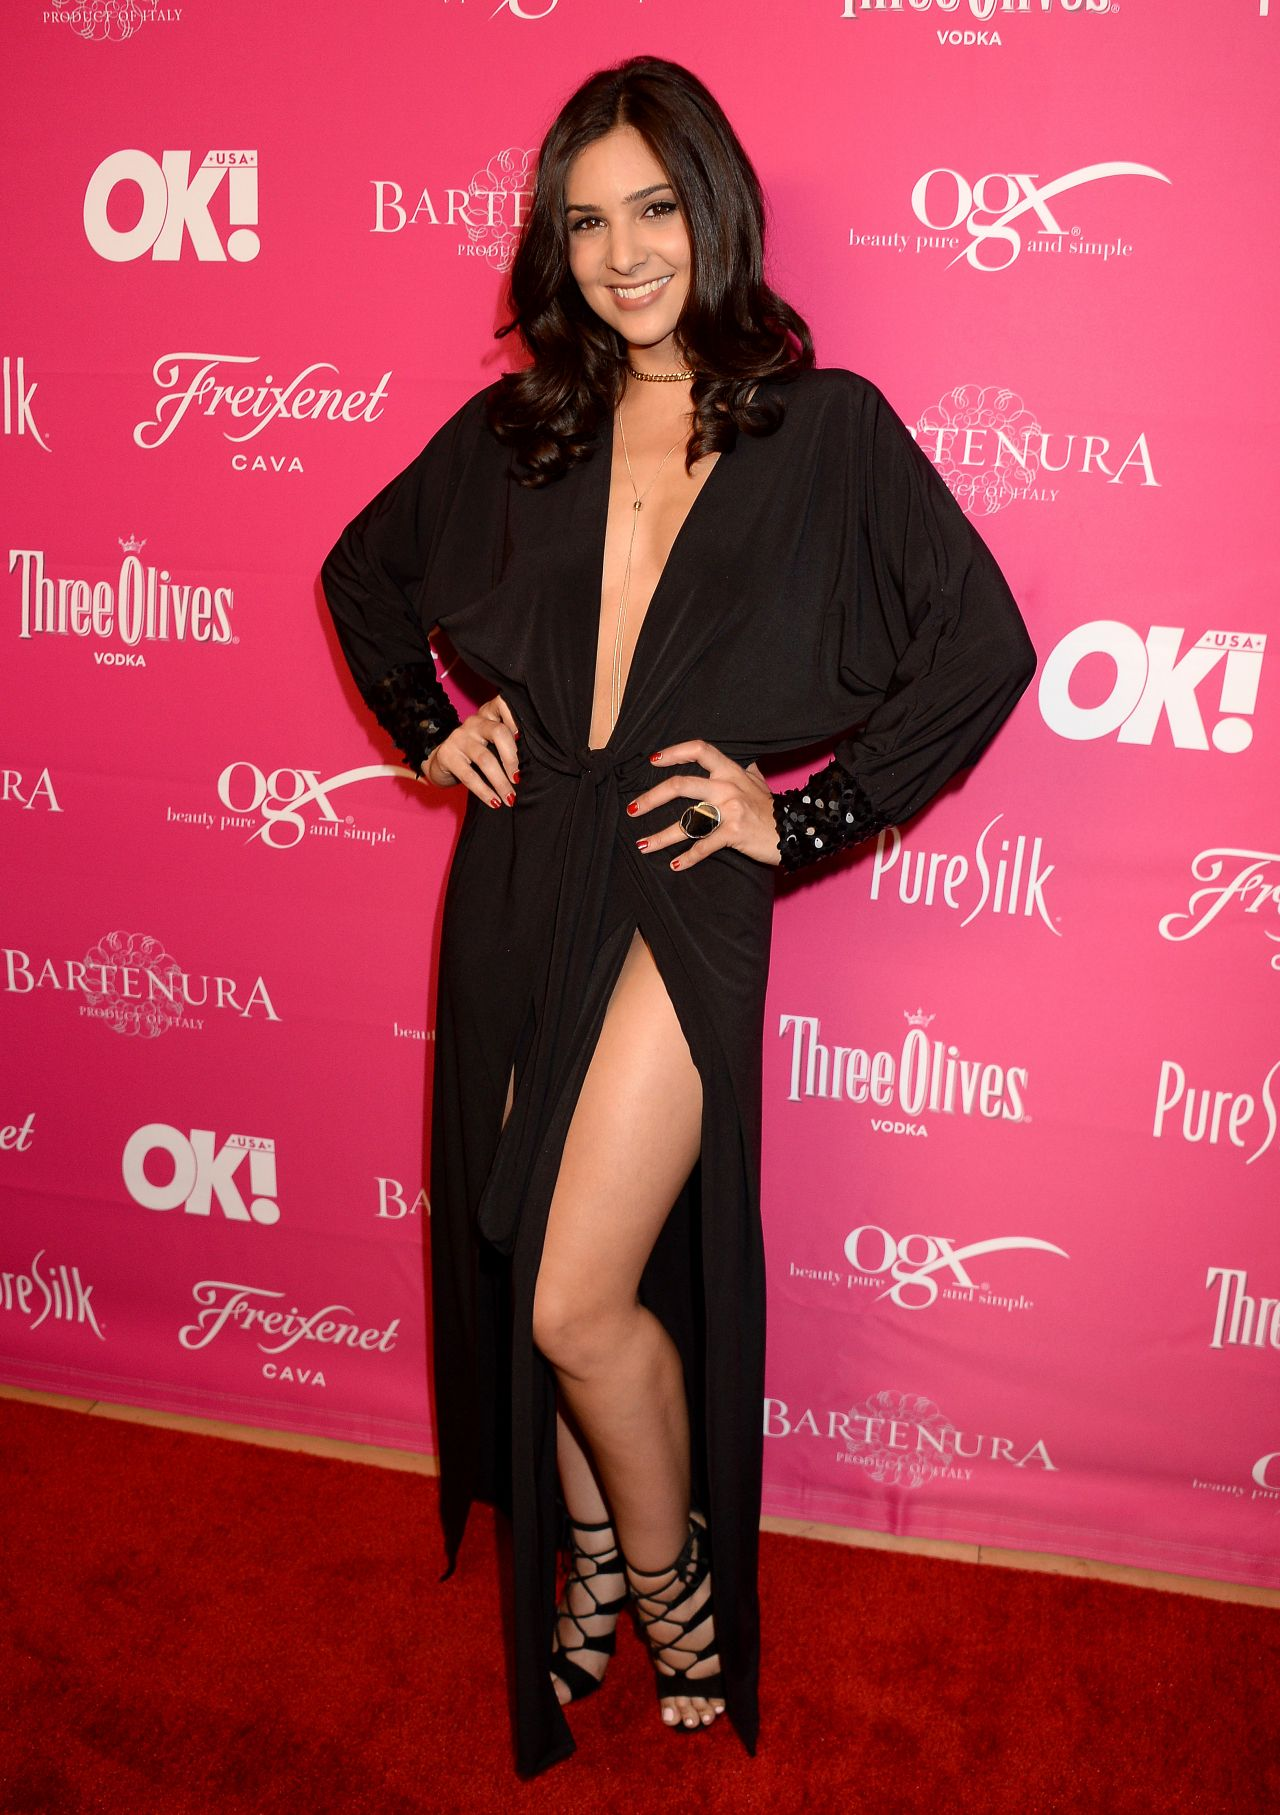 OK! Magazine 'So Sexy LA' In Los Angeles 5